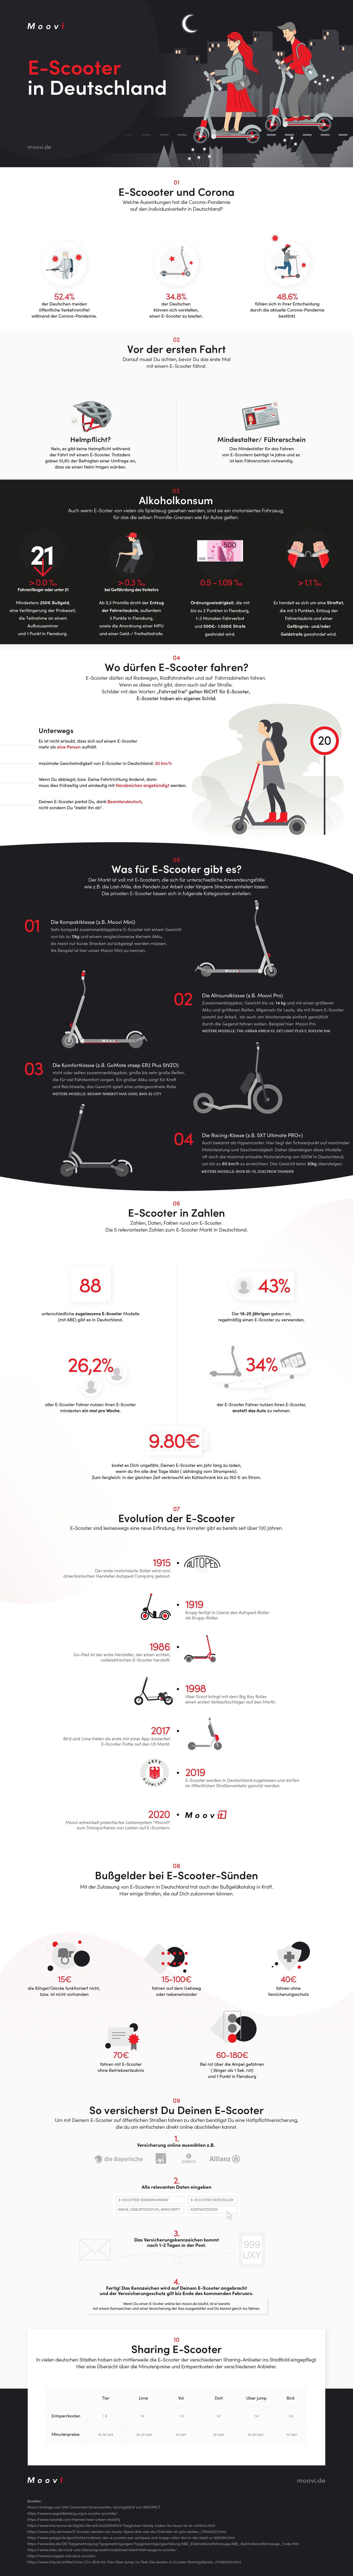 moovi escooter infographic escooter deutschland corona